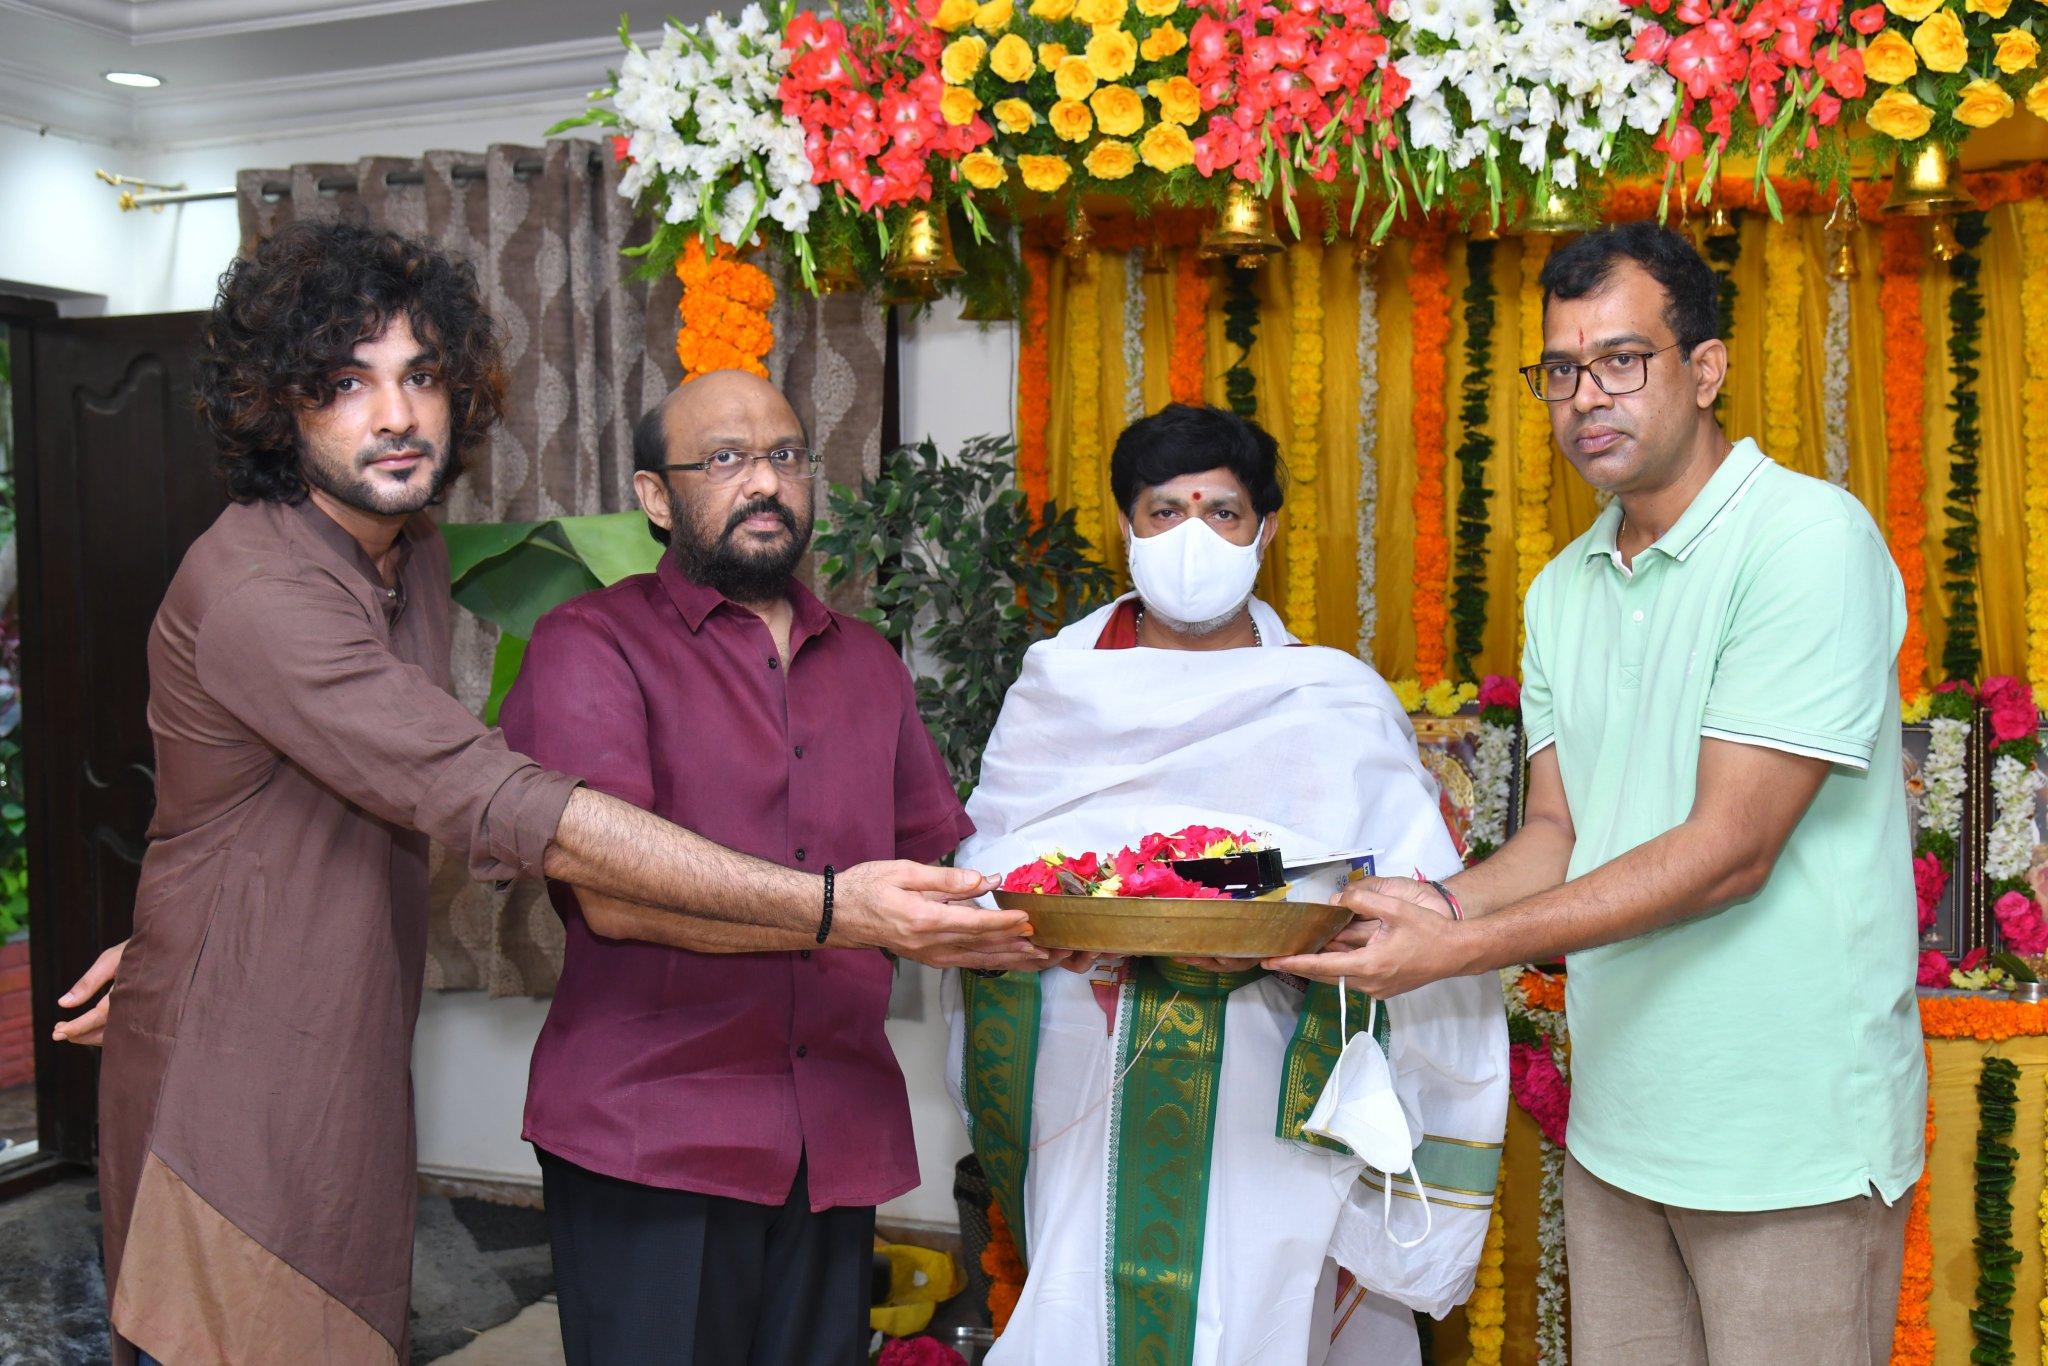 Sithara Entertainments movie, Production No. 9, which goes to sets featuring Siddhu Jonnalagadda